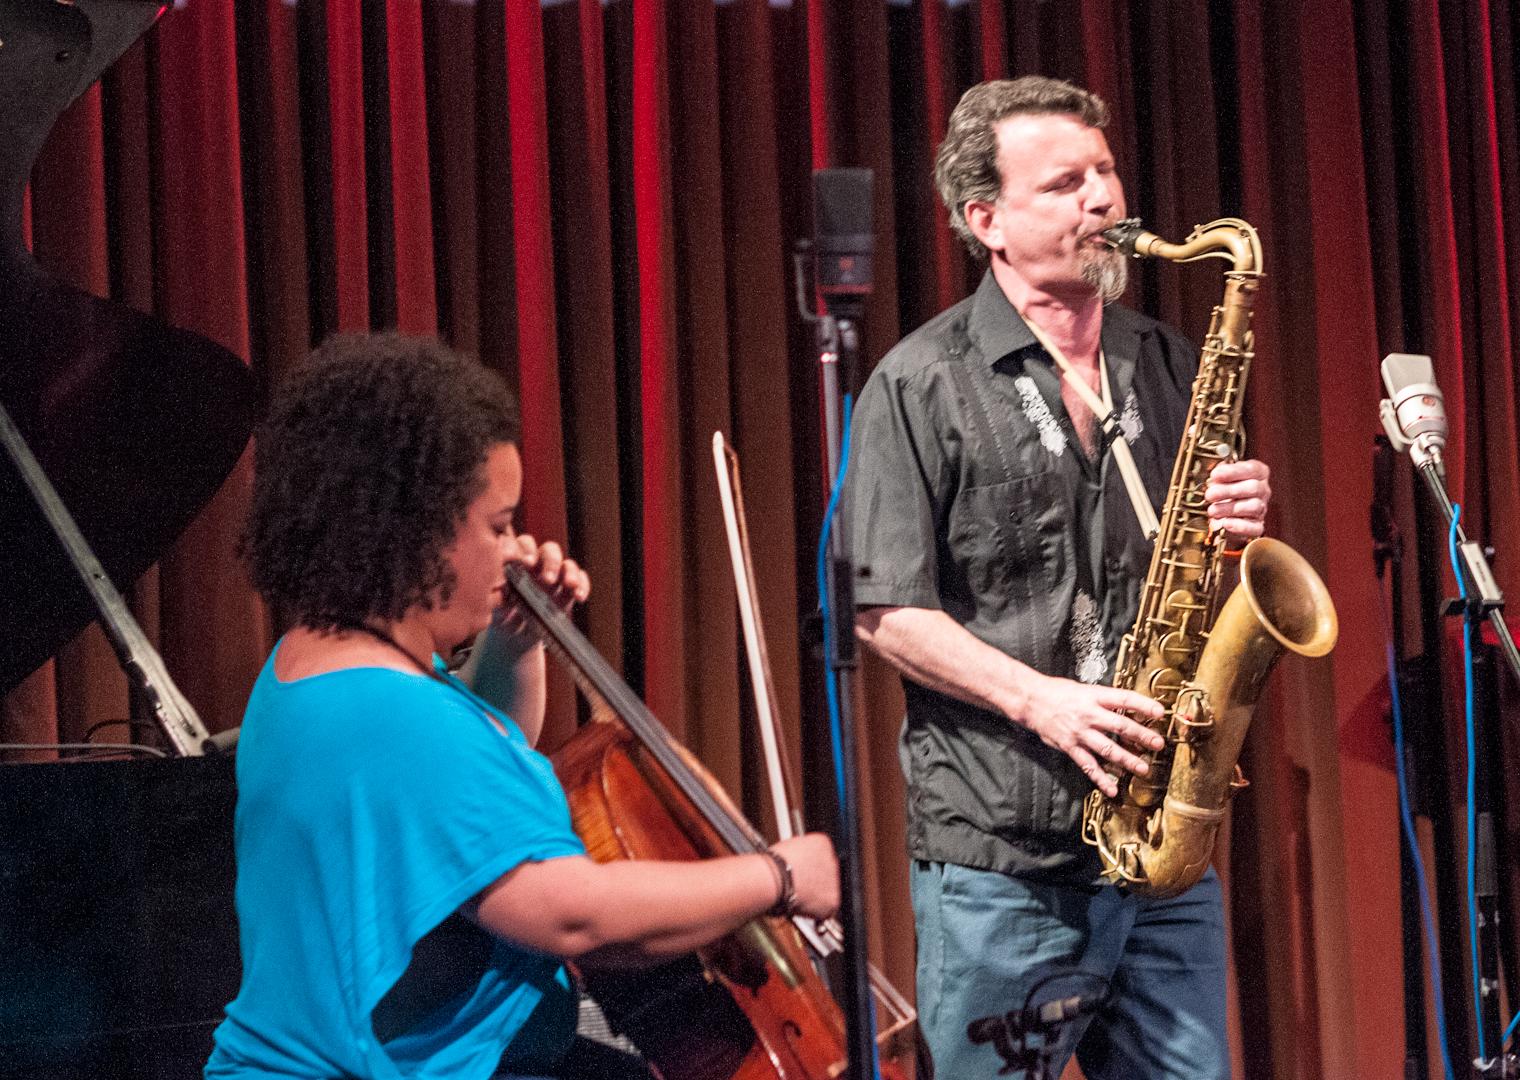 Marika Hughes and Jeff Lederer at the Undead Music Festival